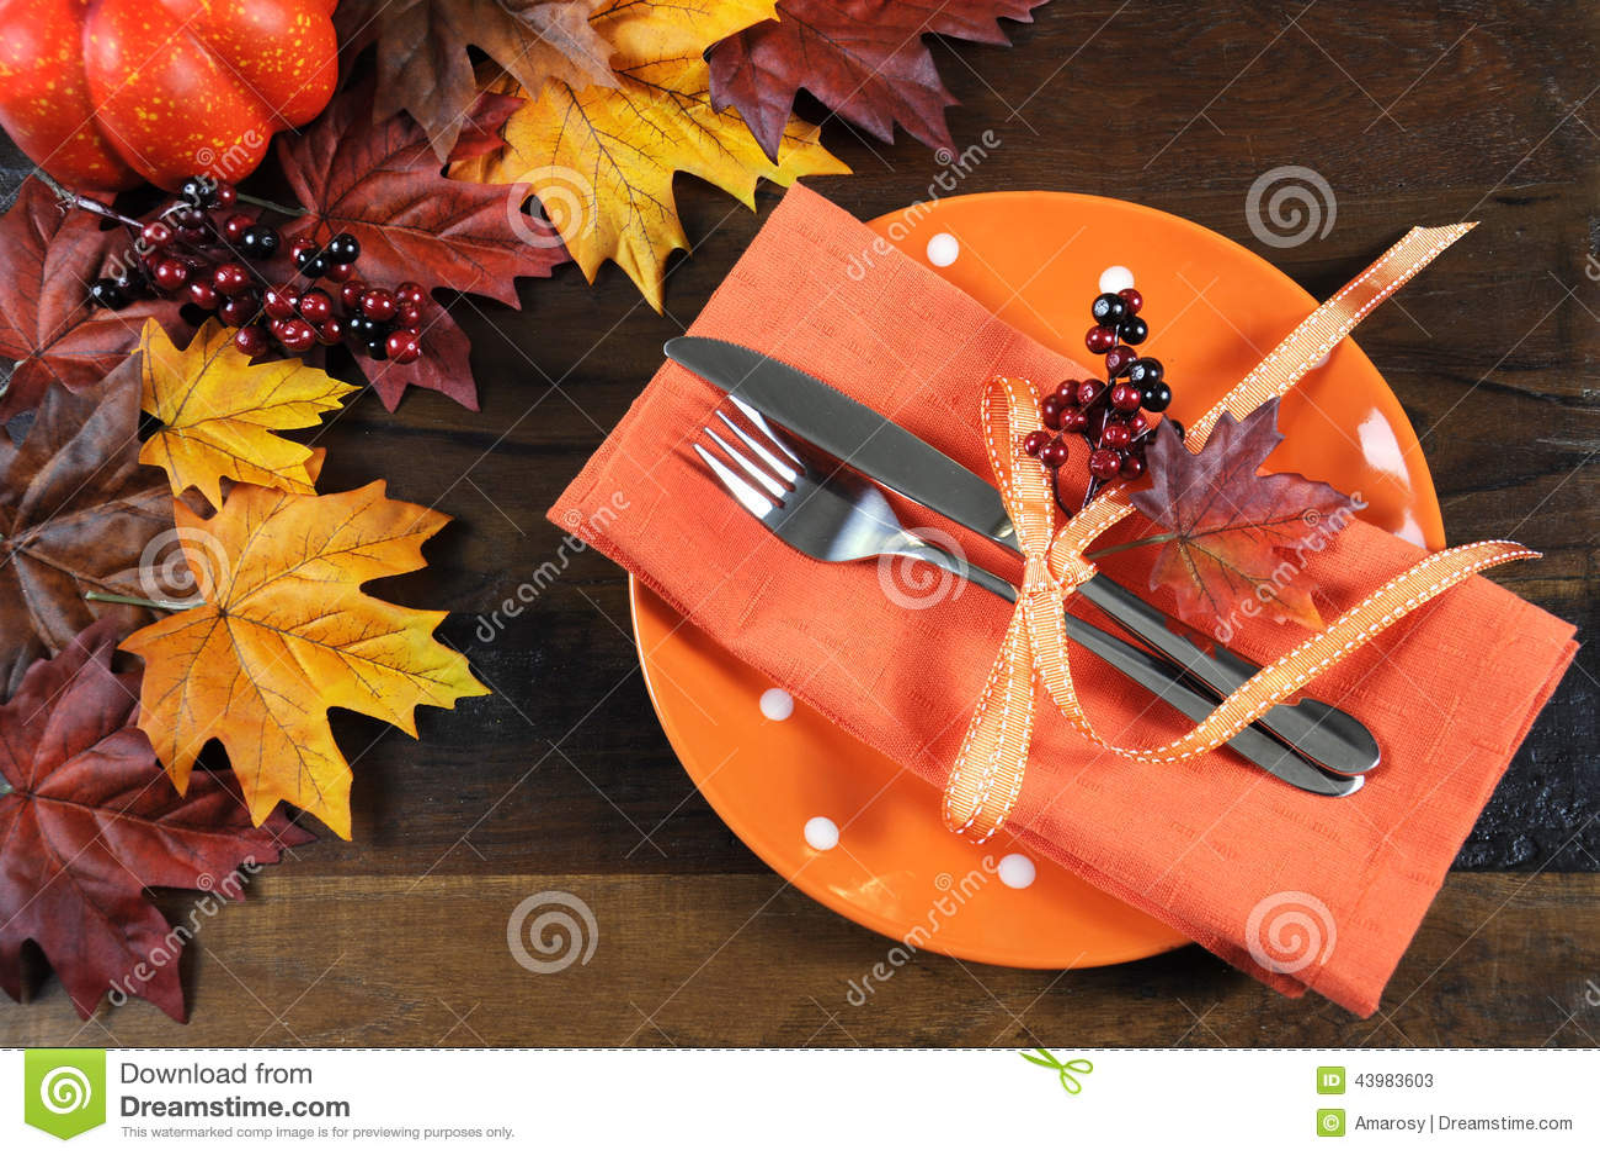 Dark Fall Wallpaper Thanksgiving Table Place Setting Stock Photo Image